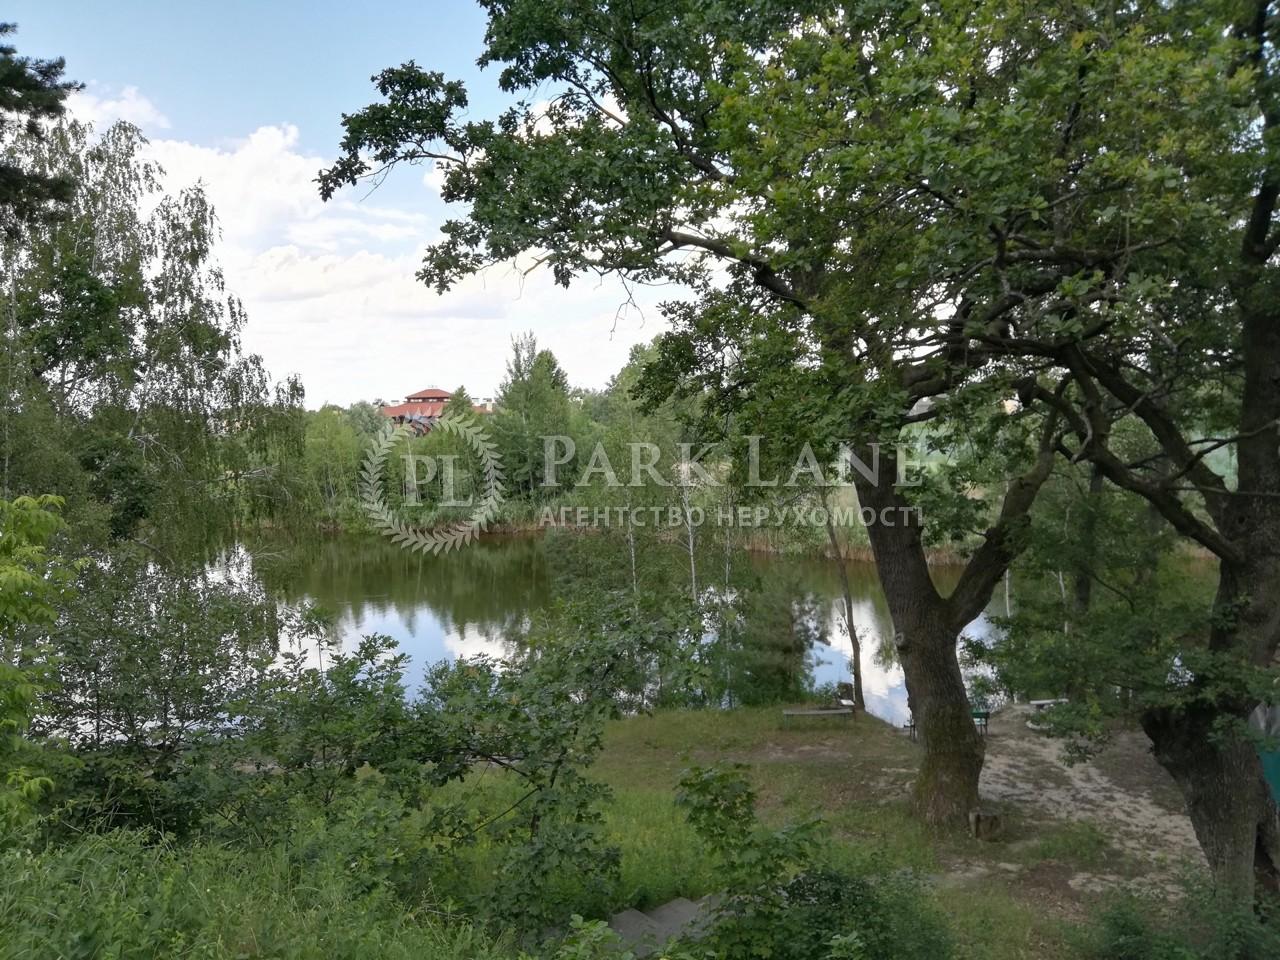 Квартира Столичное шоссе, 149, Киев, R-23590 - Фото 13